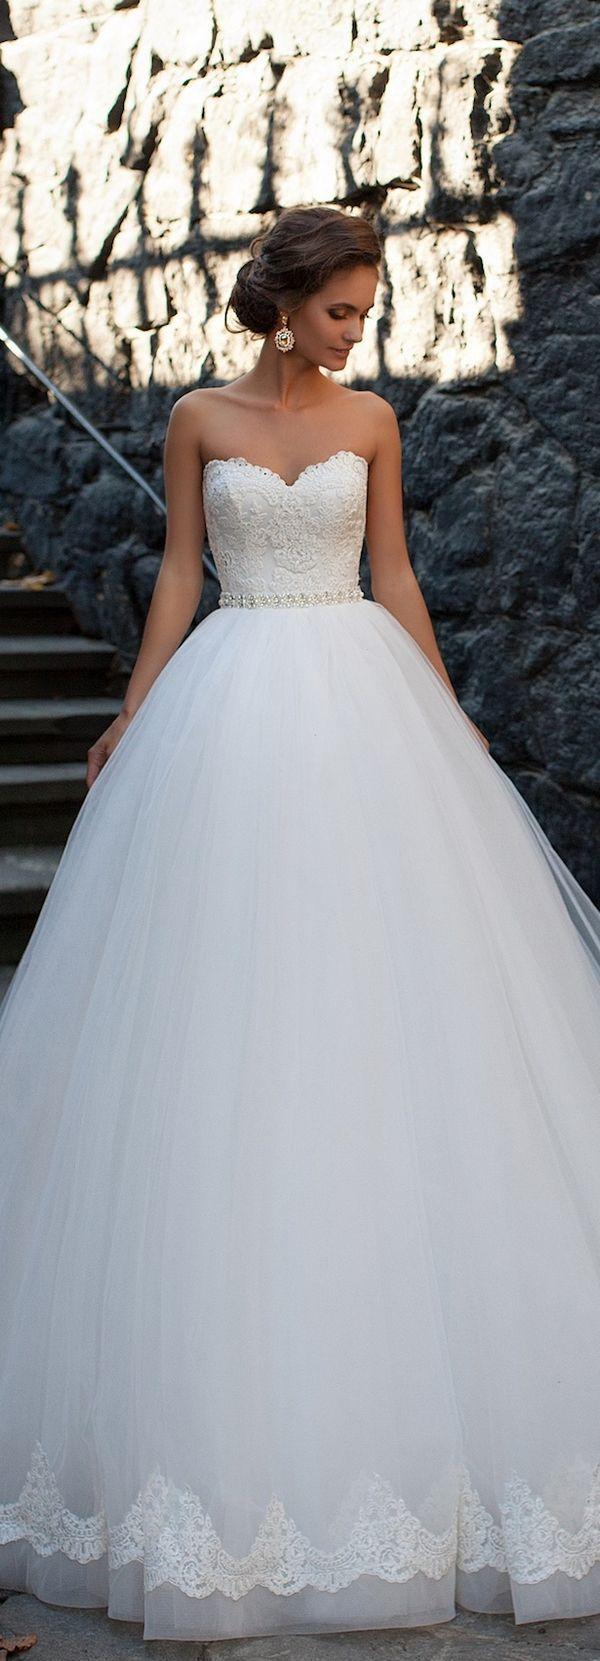 2117 best Wedding Dresses images on Pinterest | Short wedding gowns ...